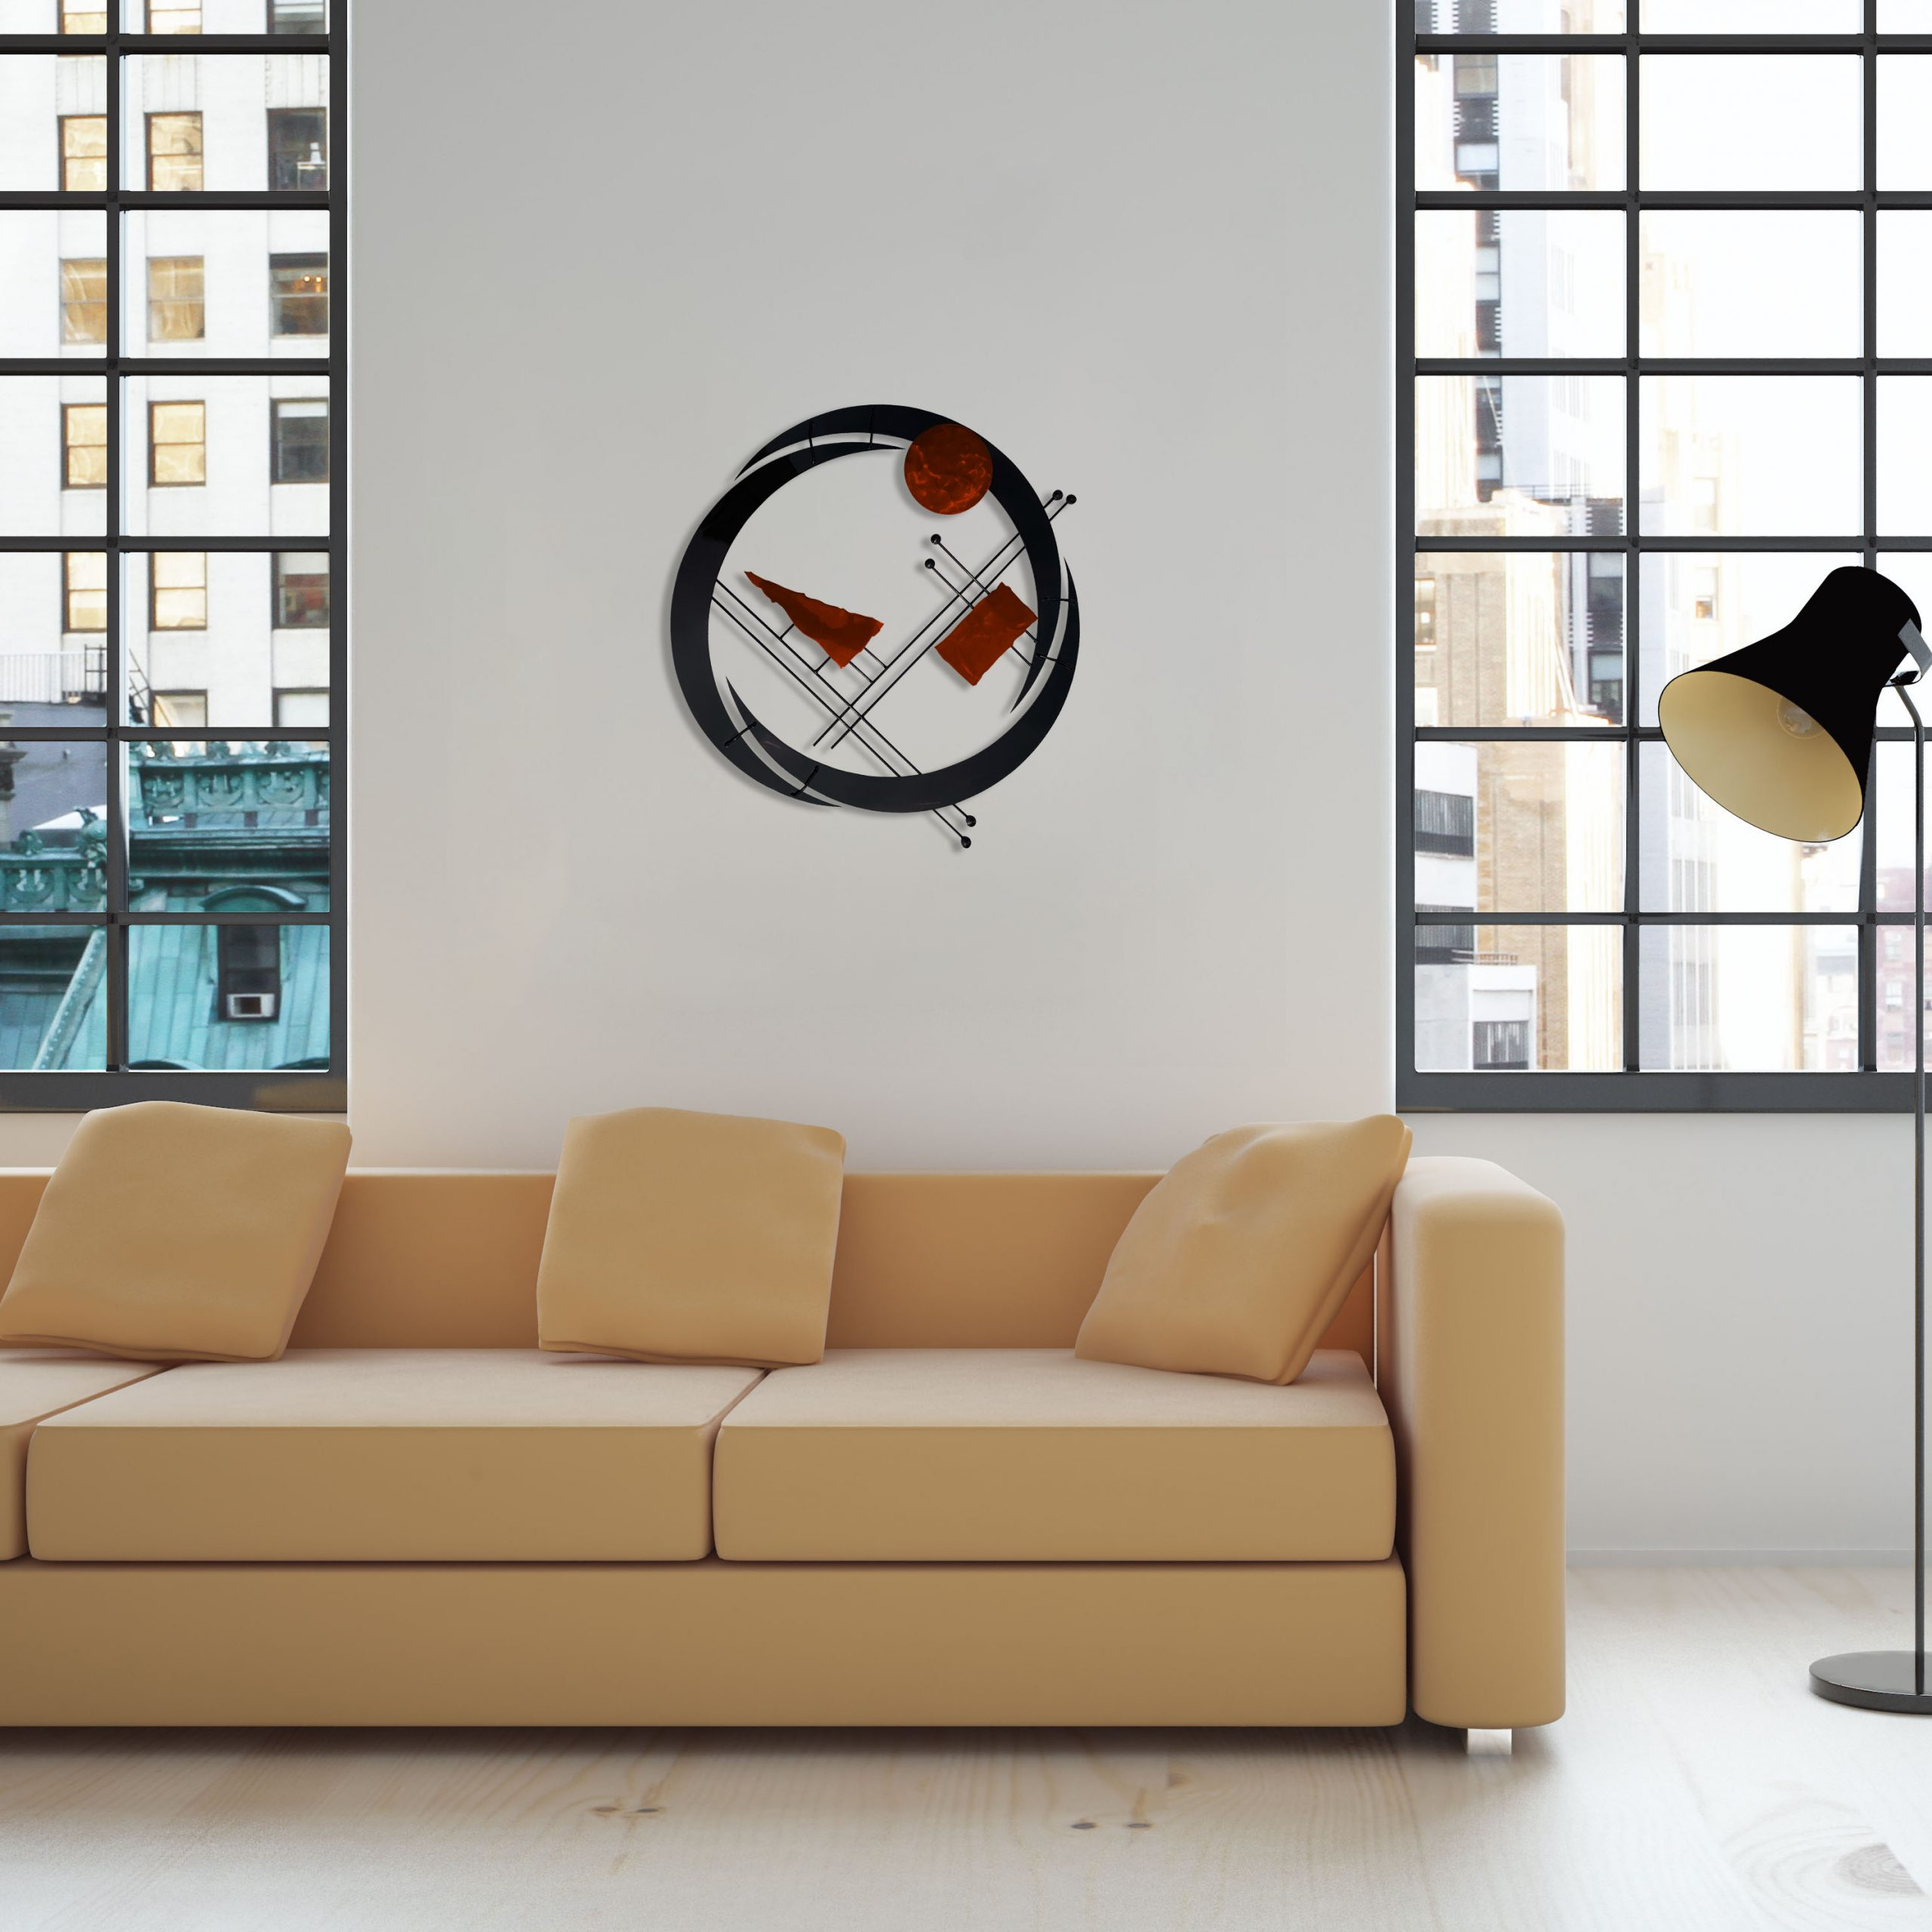 orange-Swirl-in-living-room-scaled